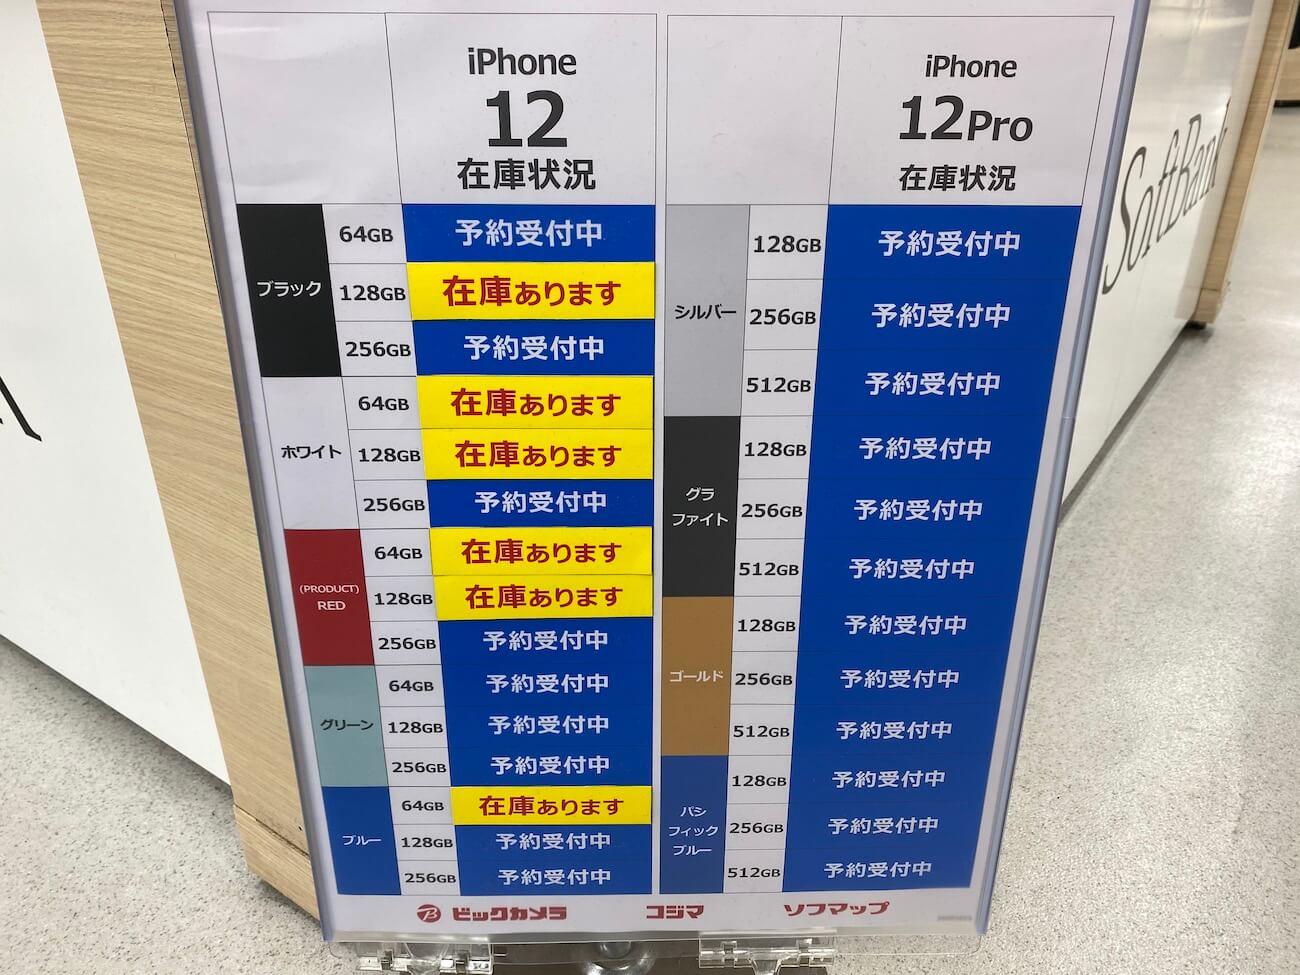 iPhone 12 人気のカラー